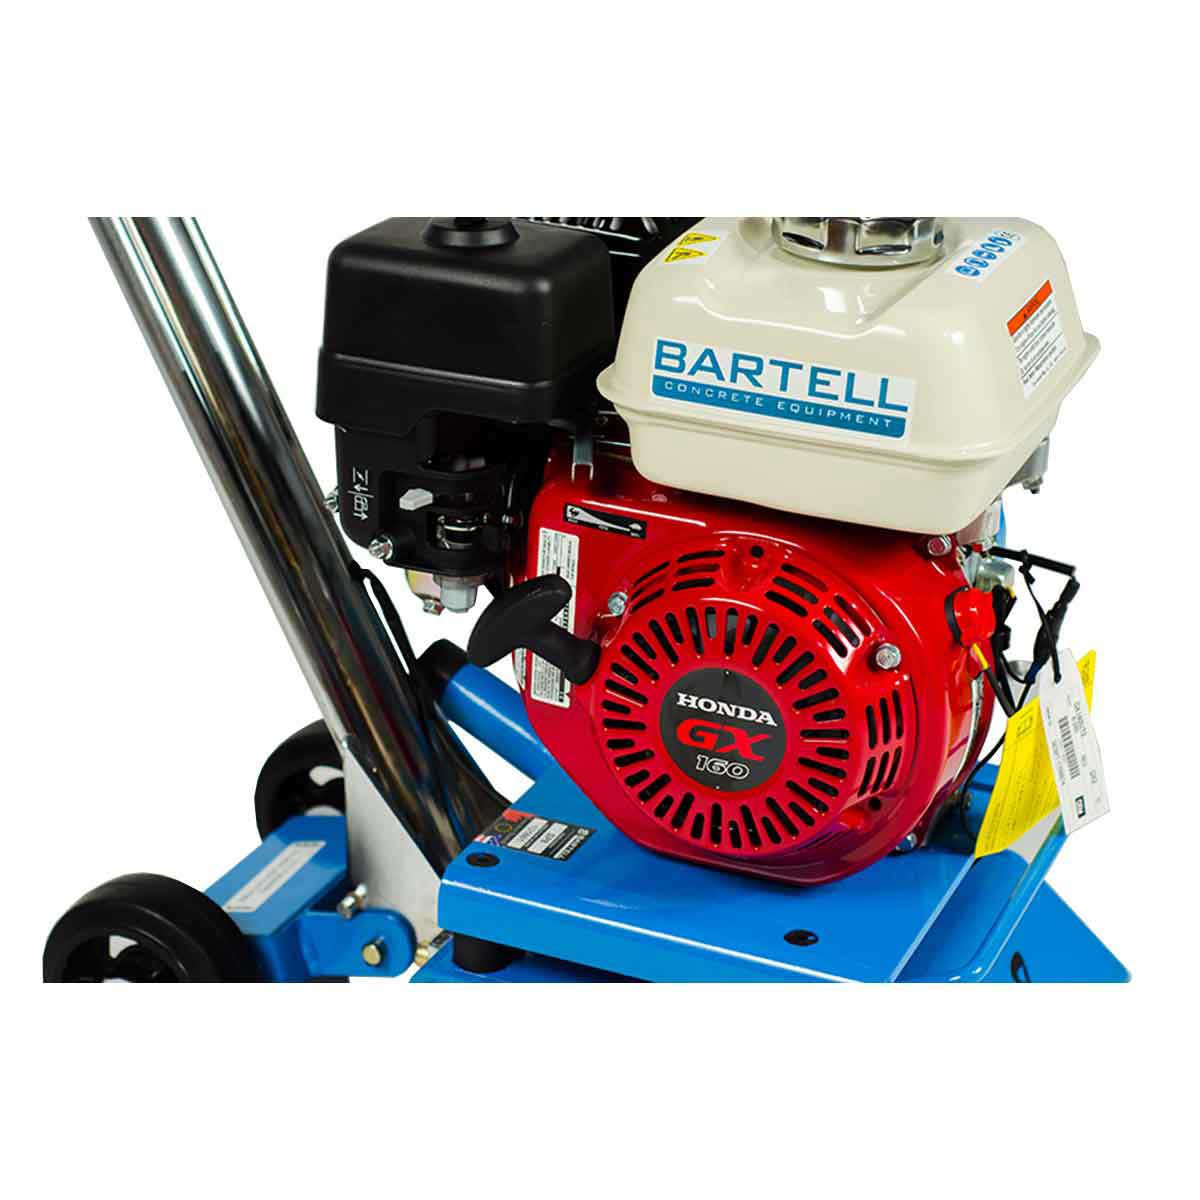 Bartell Honda Gas Scarifier motor